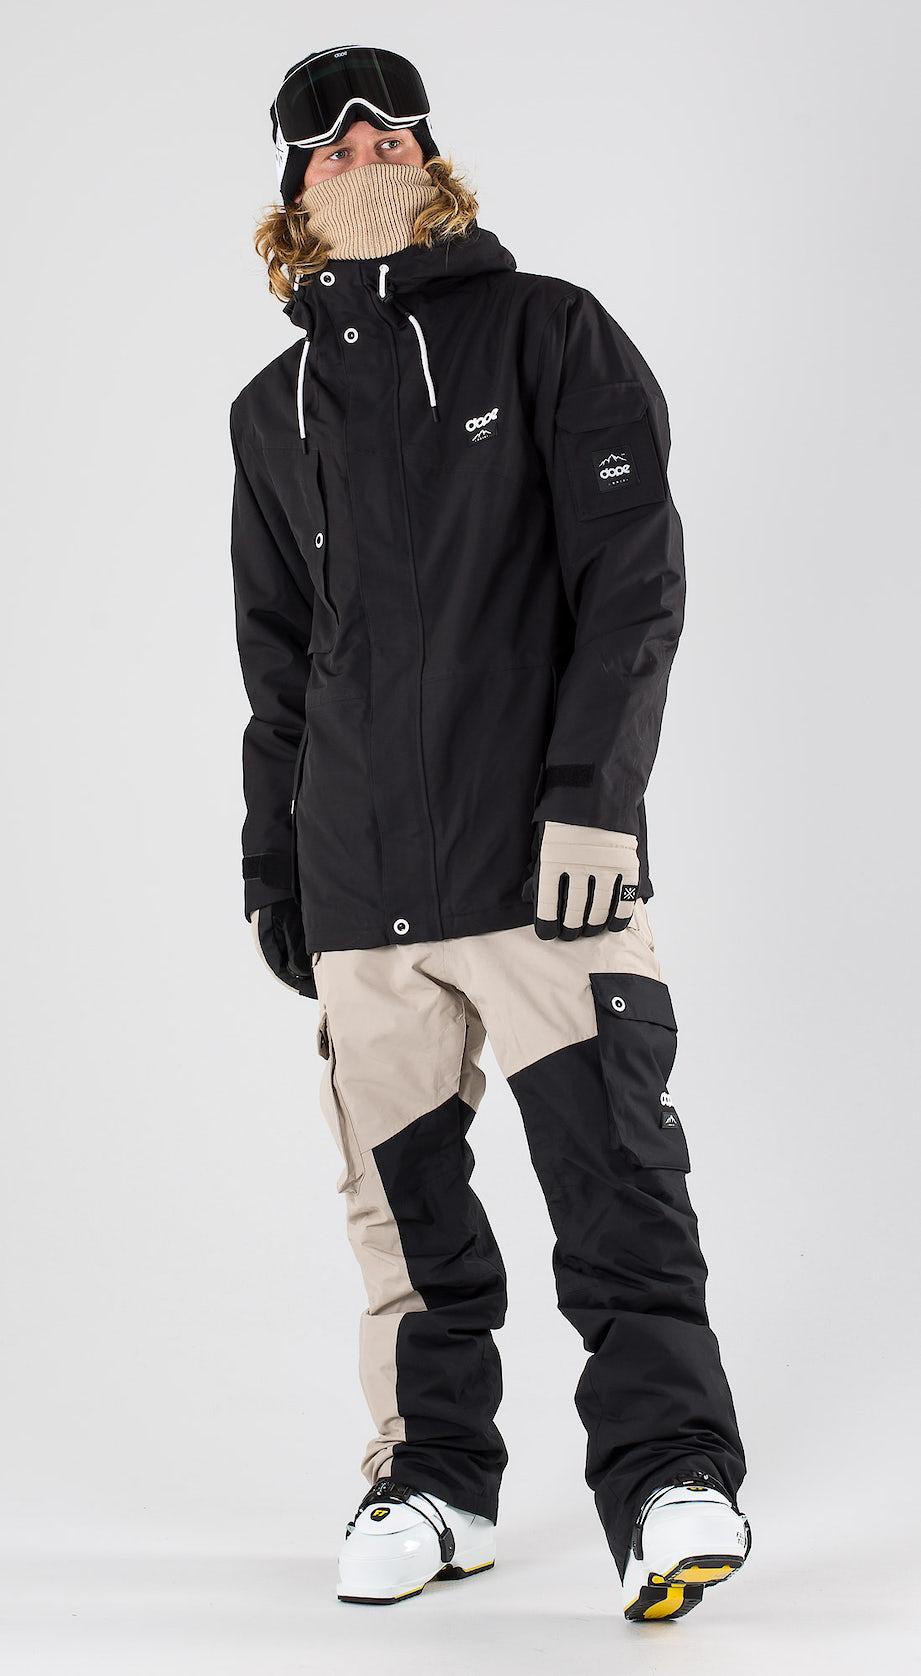 Dope Adept Black Vêtements de ski Multi